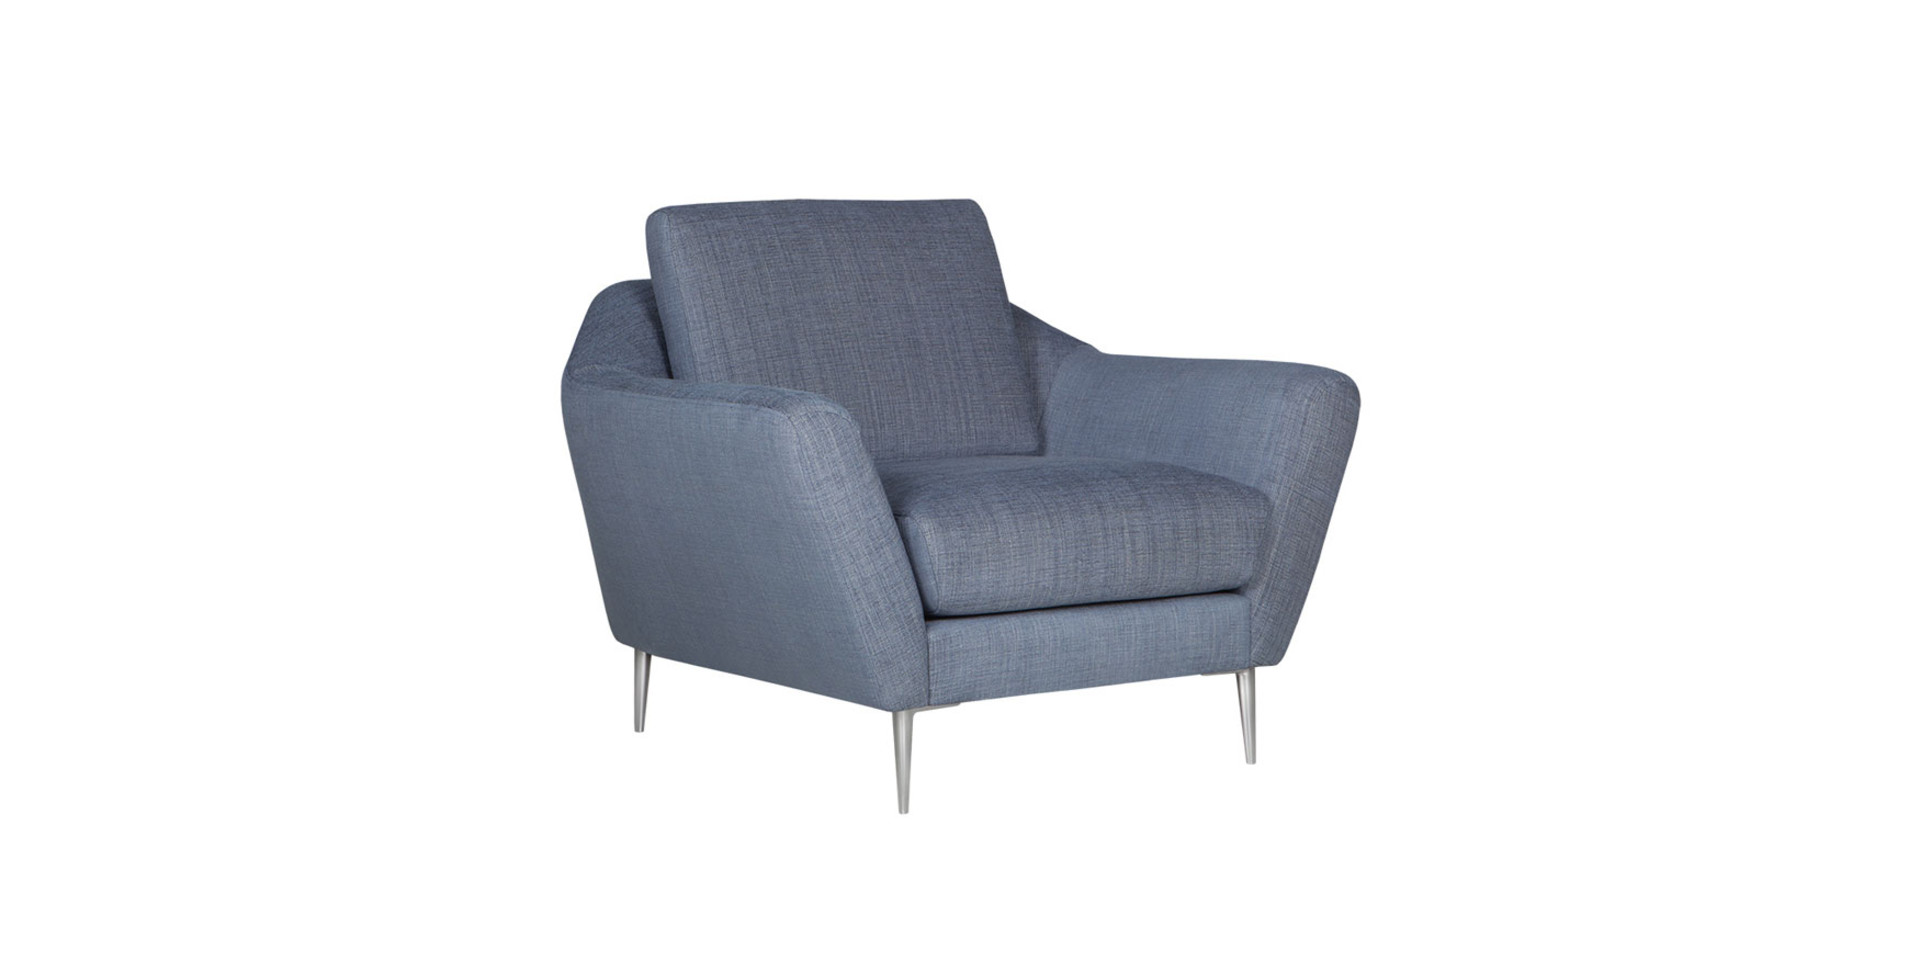 sits-agda-fauteuil-armchair_mattis45_blue_2